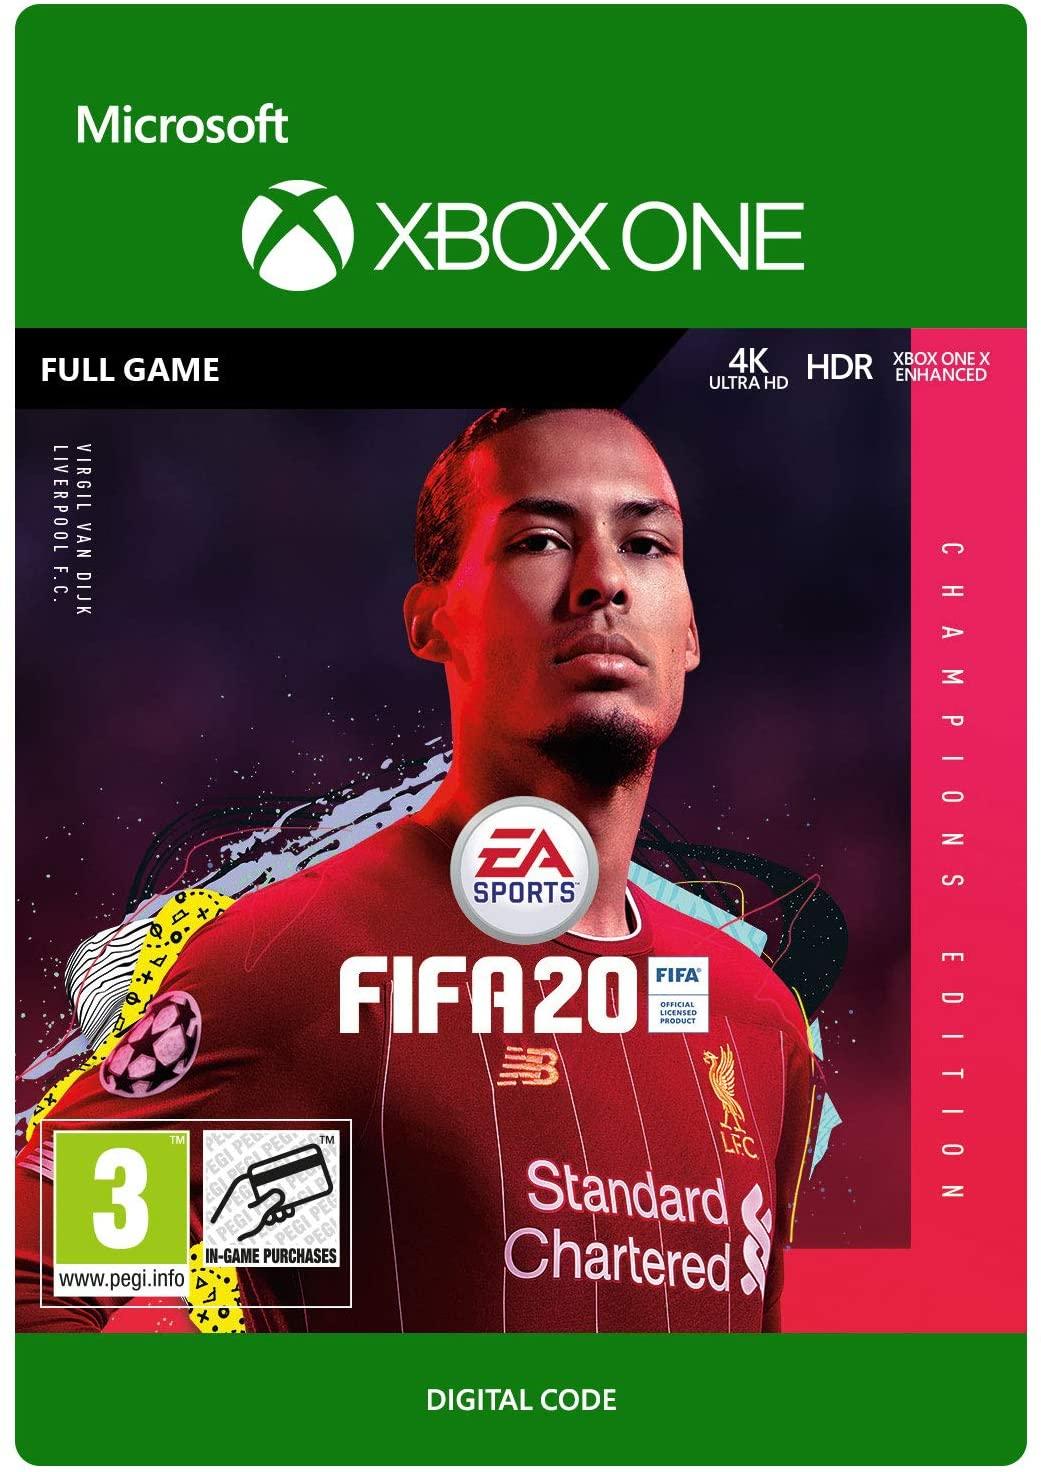 FIFA 20 Champions Edition (Xbox One) kod